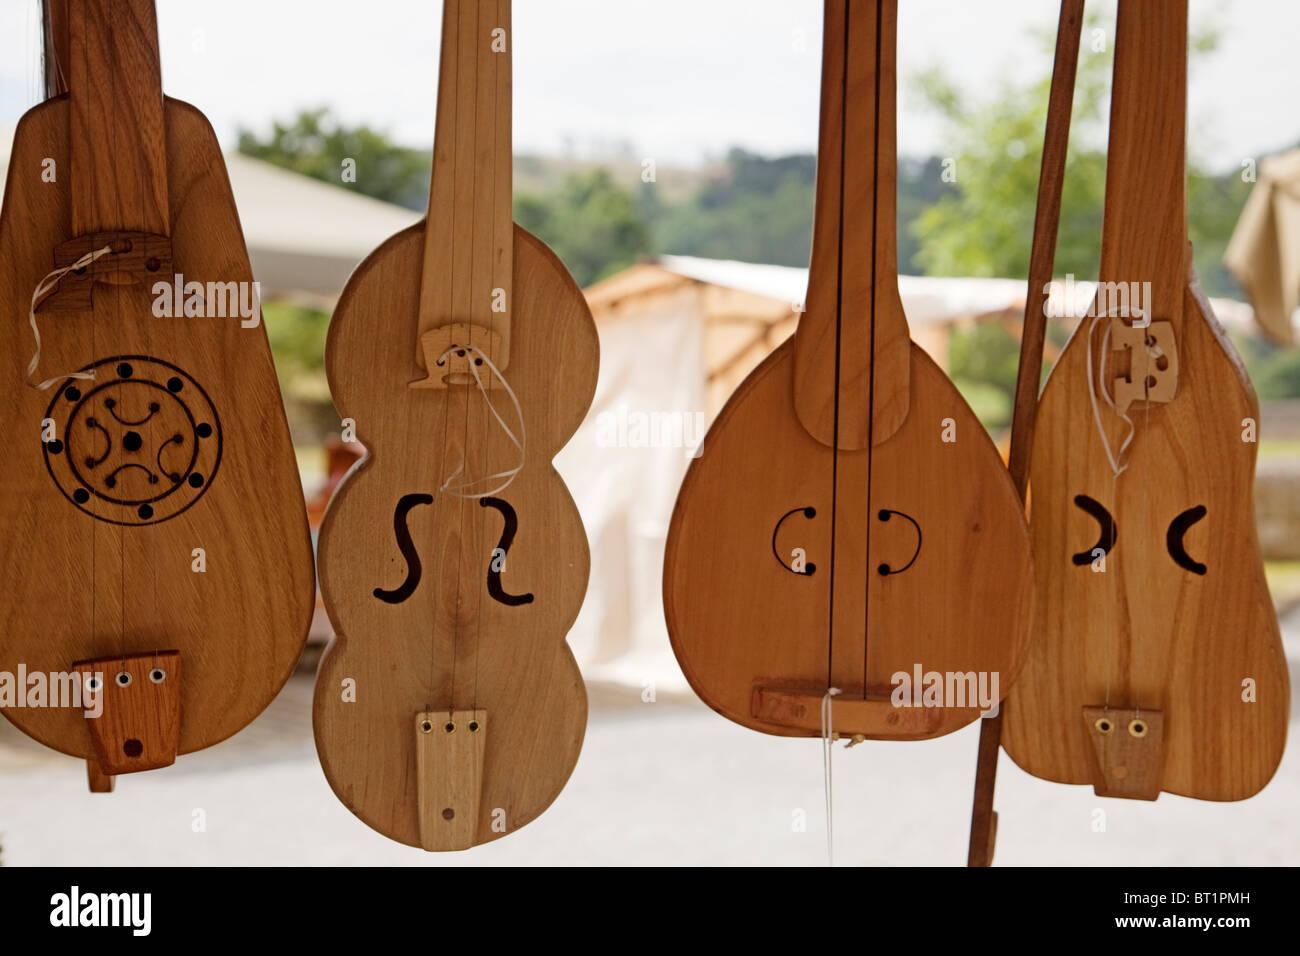 Rabel instrumento musical pasiego Cantabria España Rabel musical instrument pasiego Cantabria Spain - Stock Image